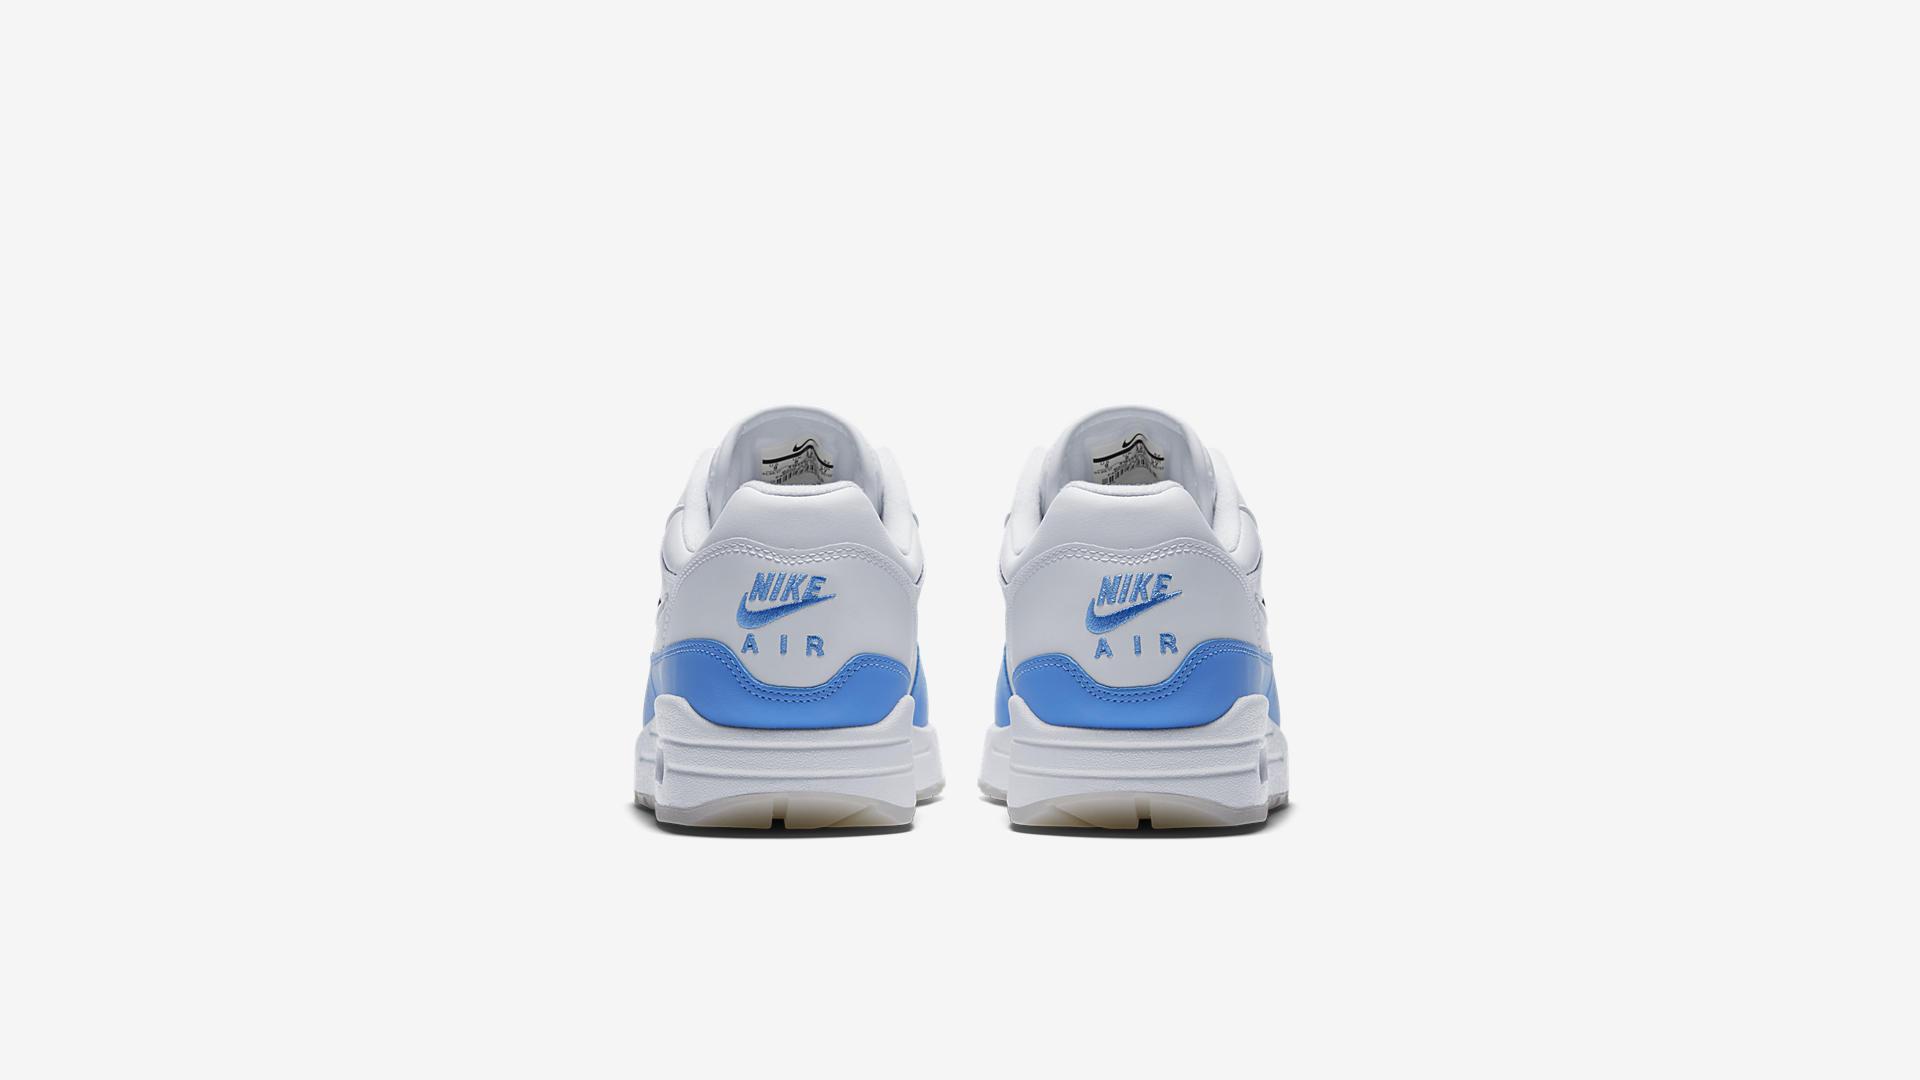 918354 102 Nike Air Max 1 Premium Jewel University Blue 2